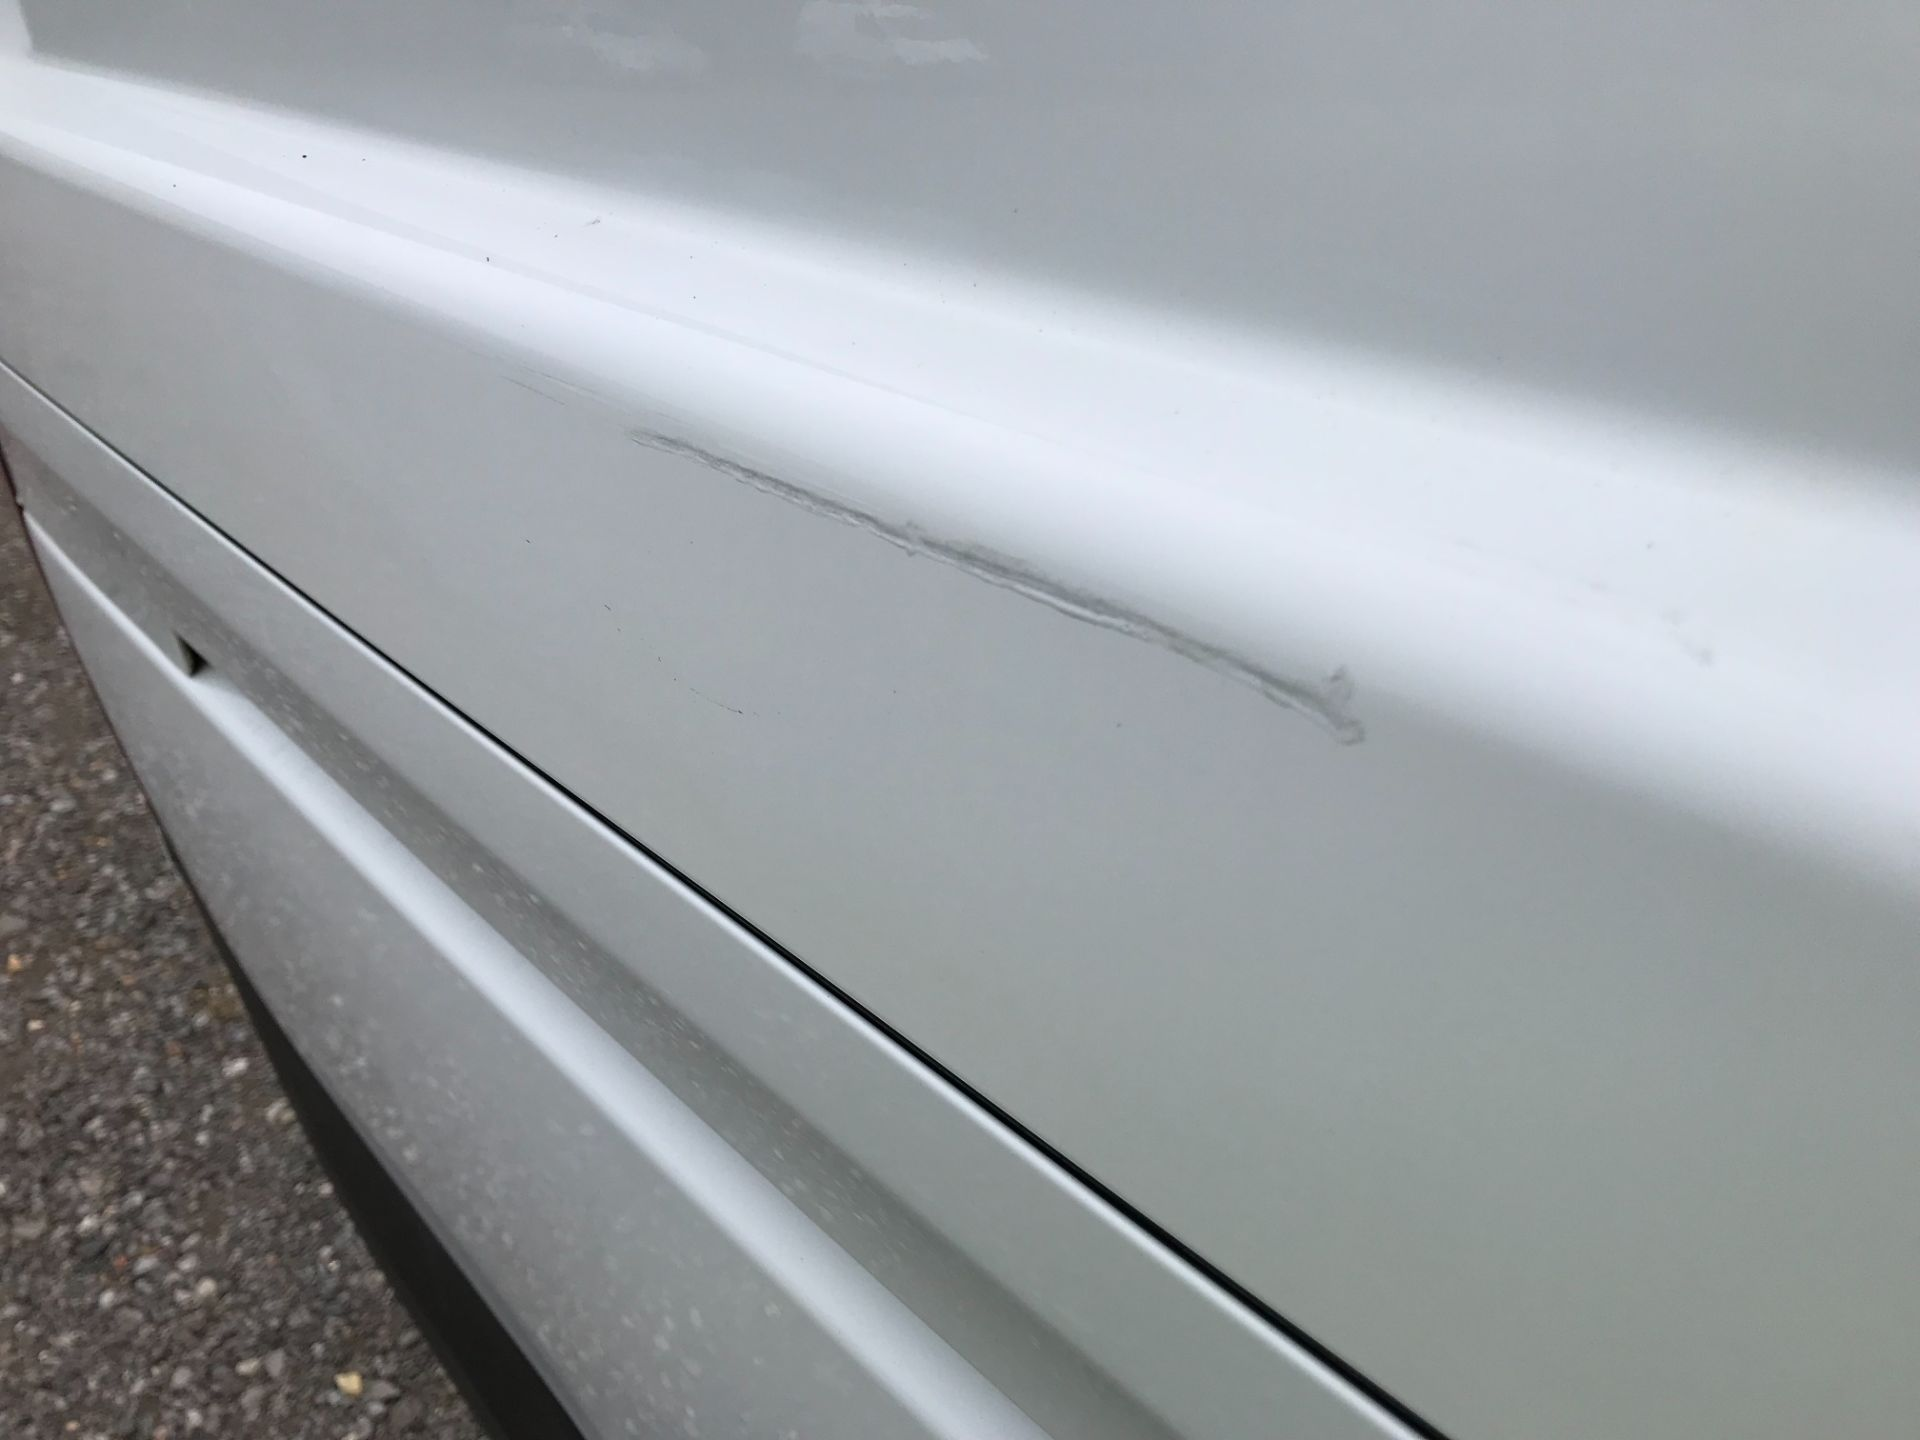 2017 Mercedes-Benz Vito LONG 111CDI VAN EURO 6  (KM67BCV) Image 37